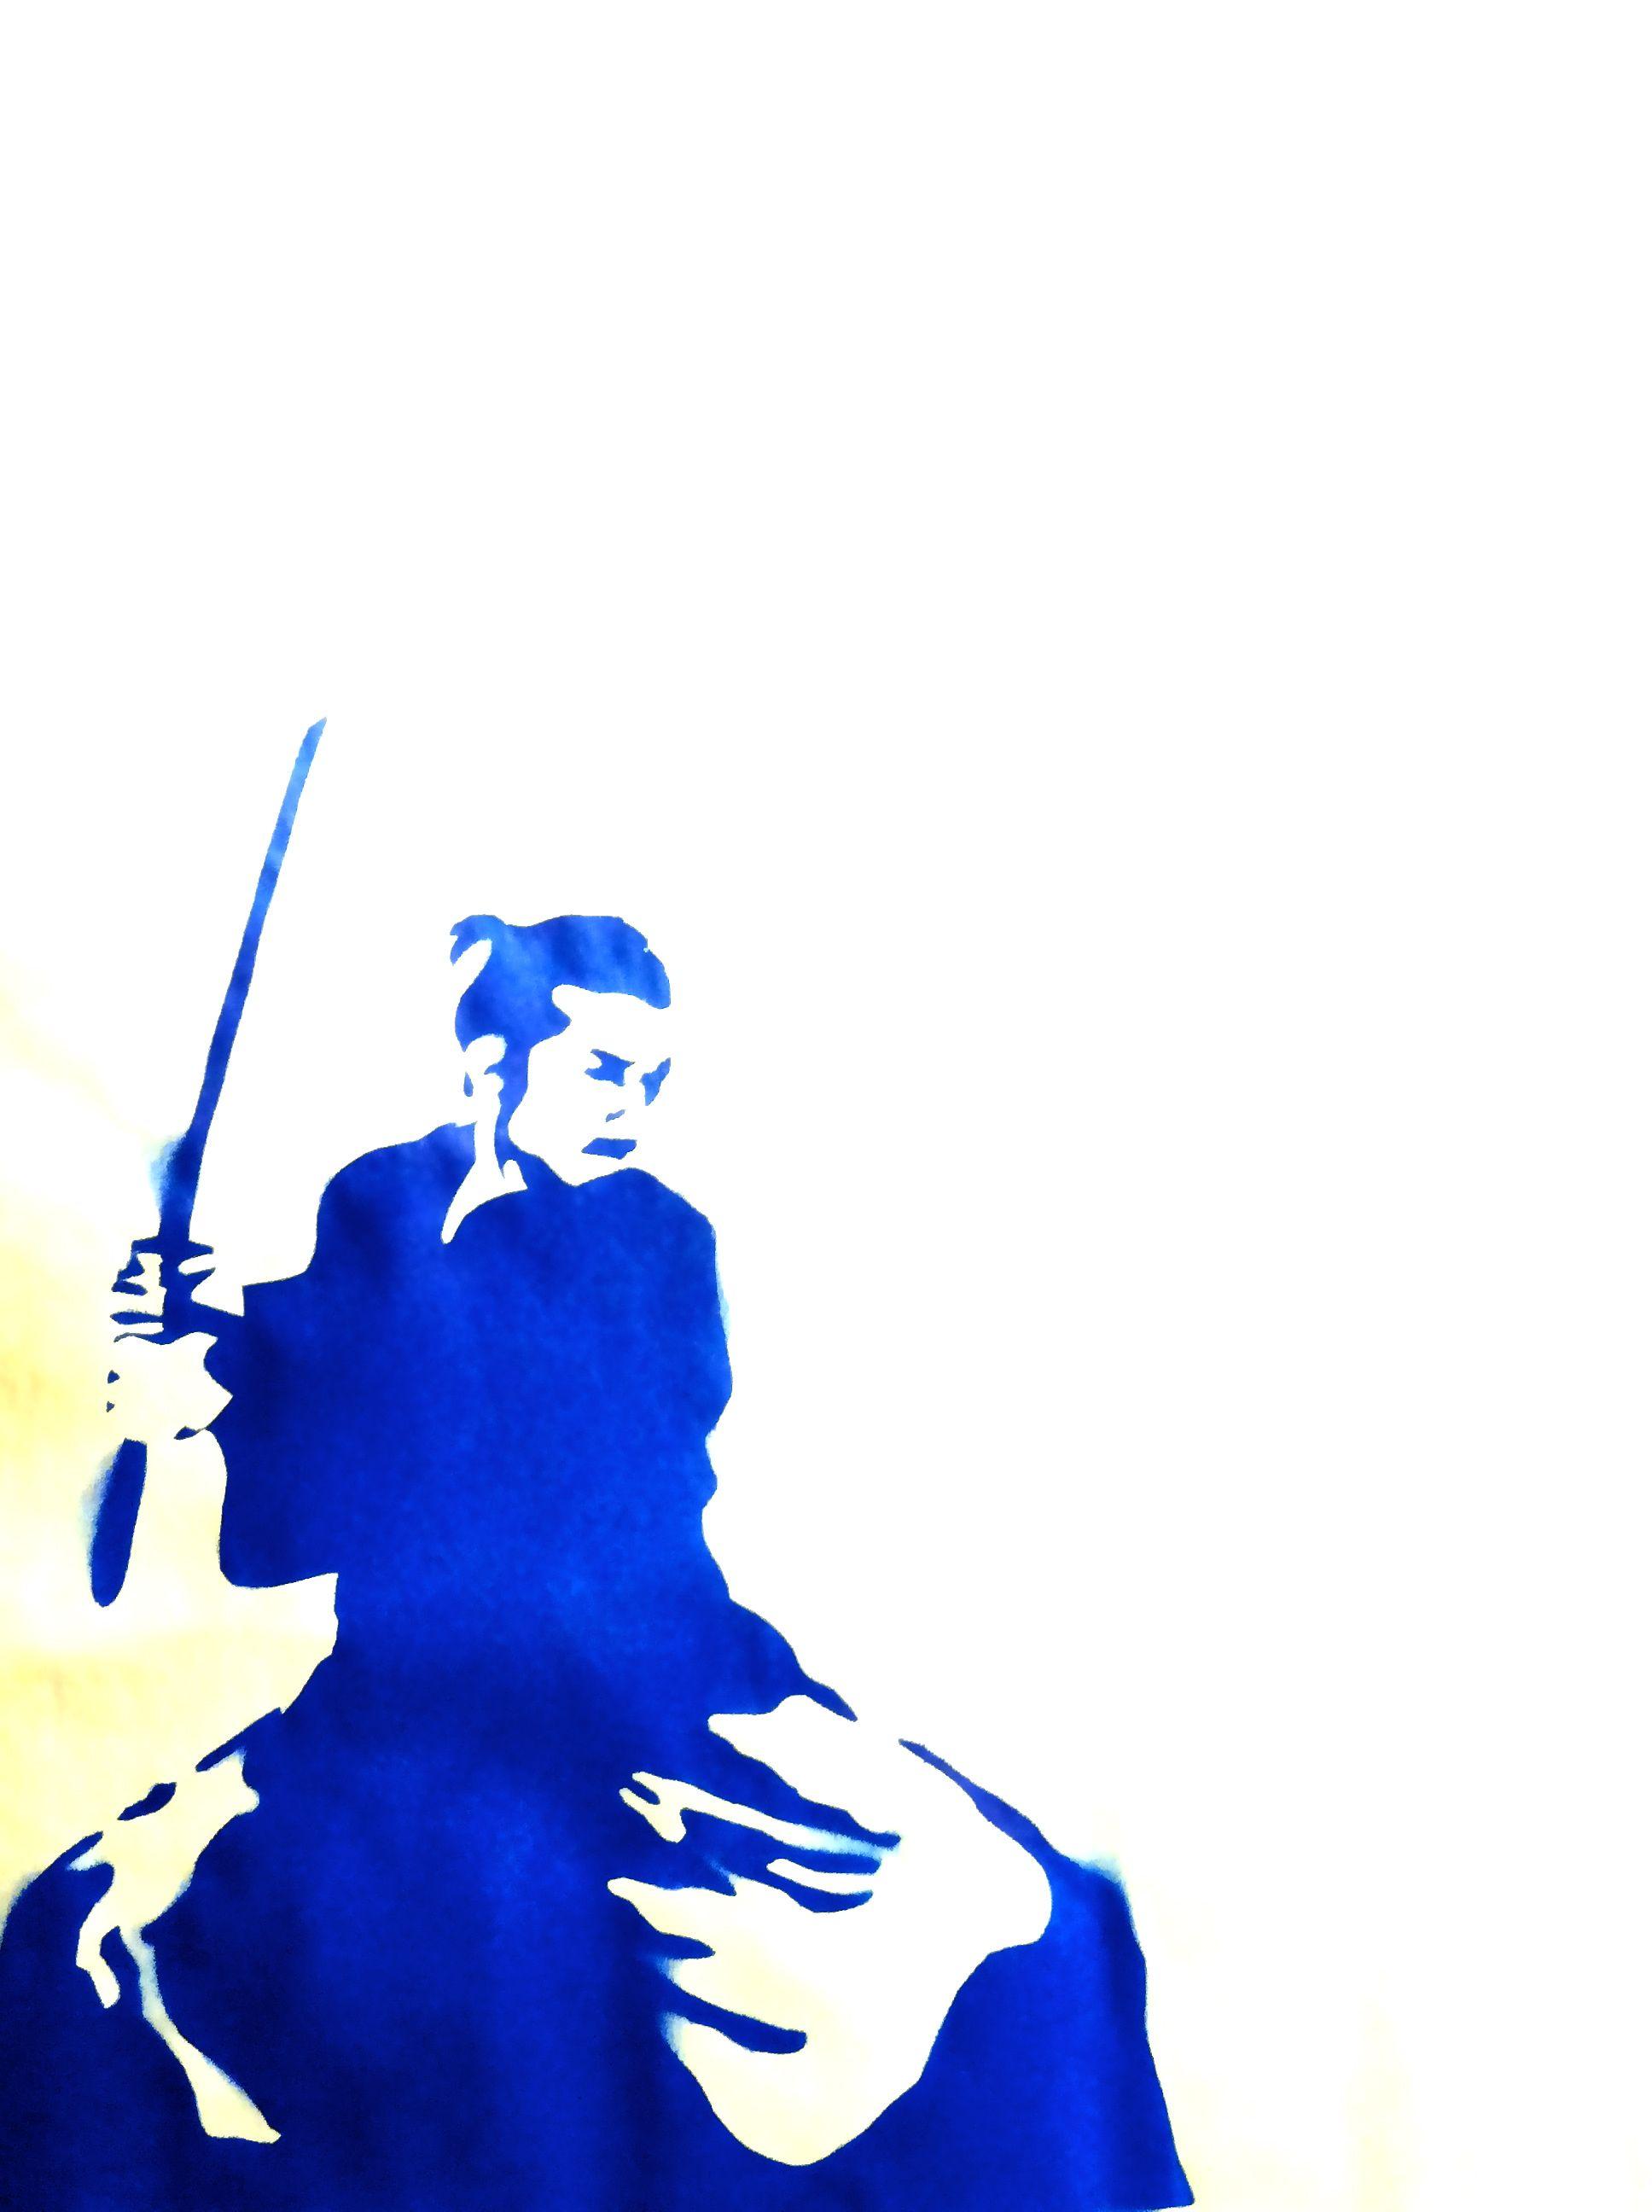 Samurai spray paint stencil spray paint stencils stencil painting spray painting geisha